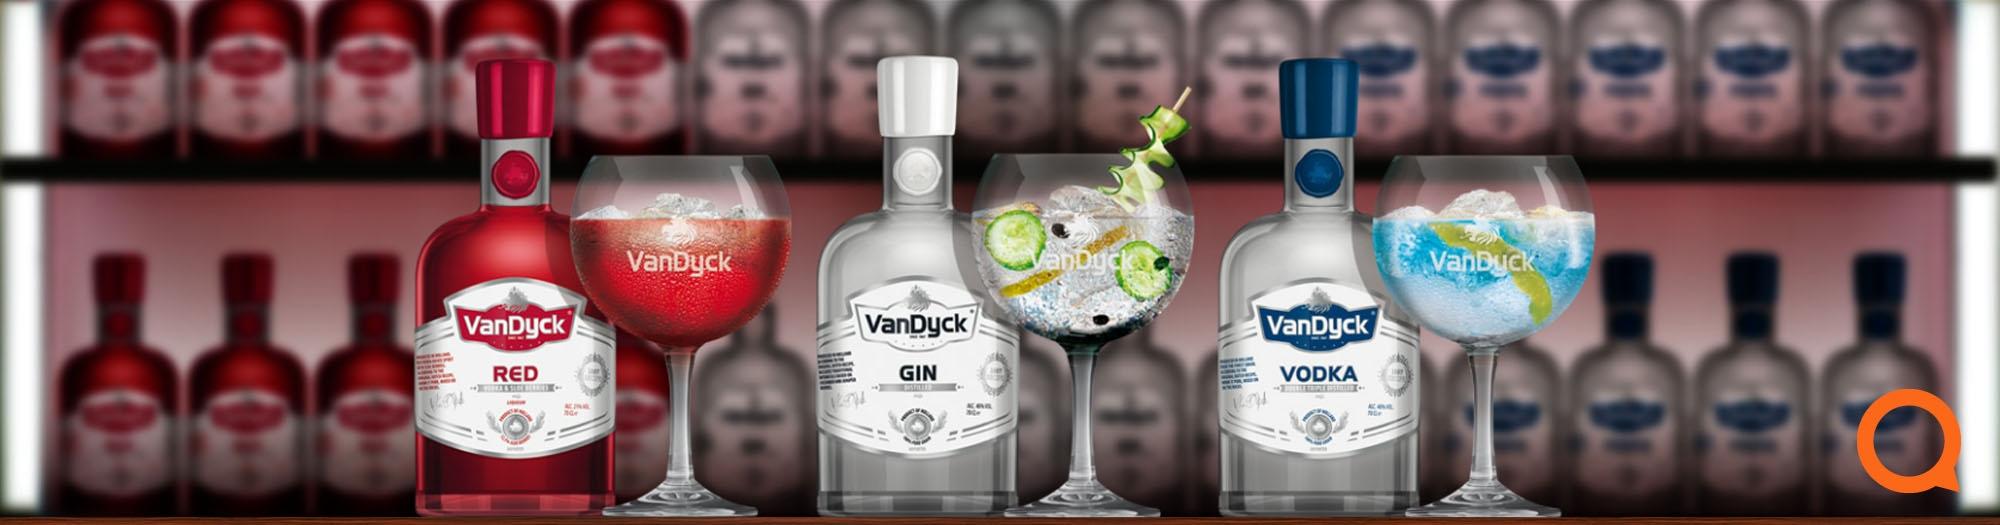 VanDyck gin